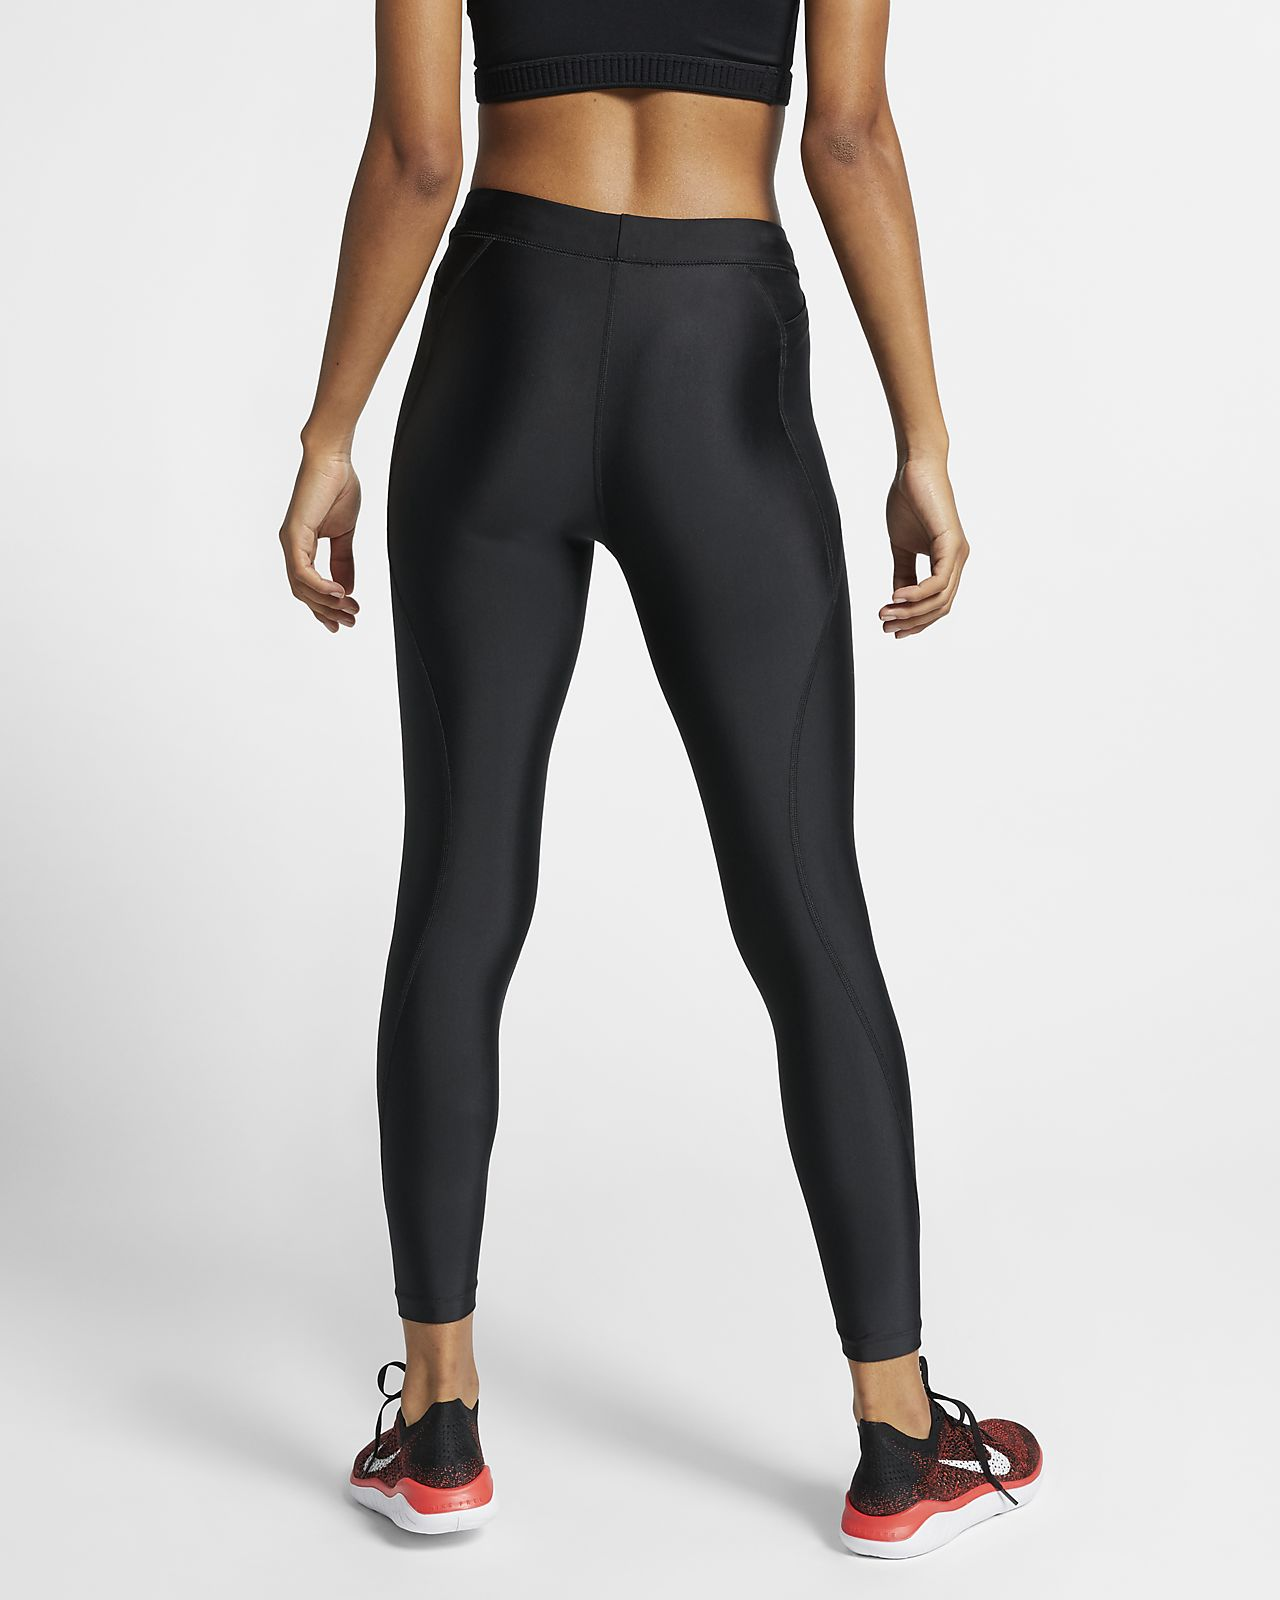 976bf4e1483b Γυναικείο κολάν 7 8 Nike Speed. Nike.com GR